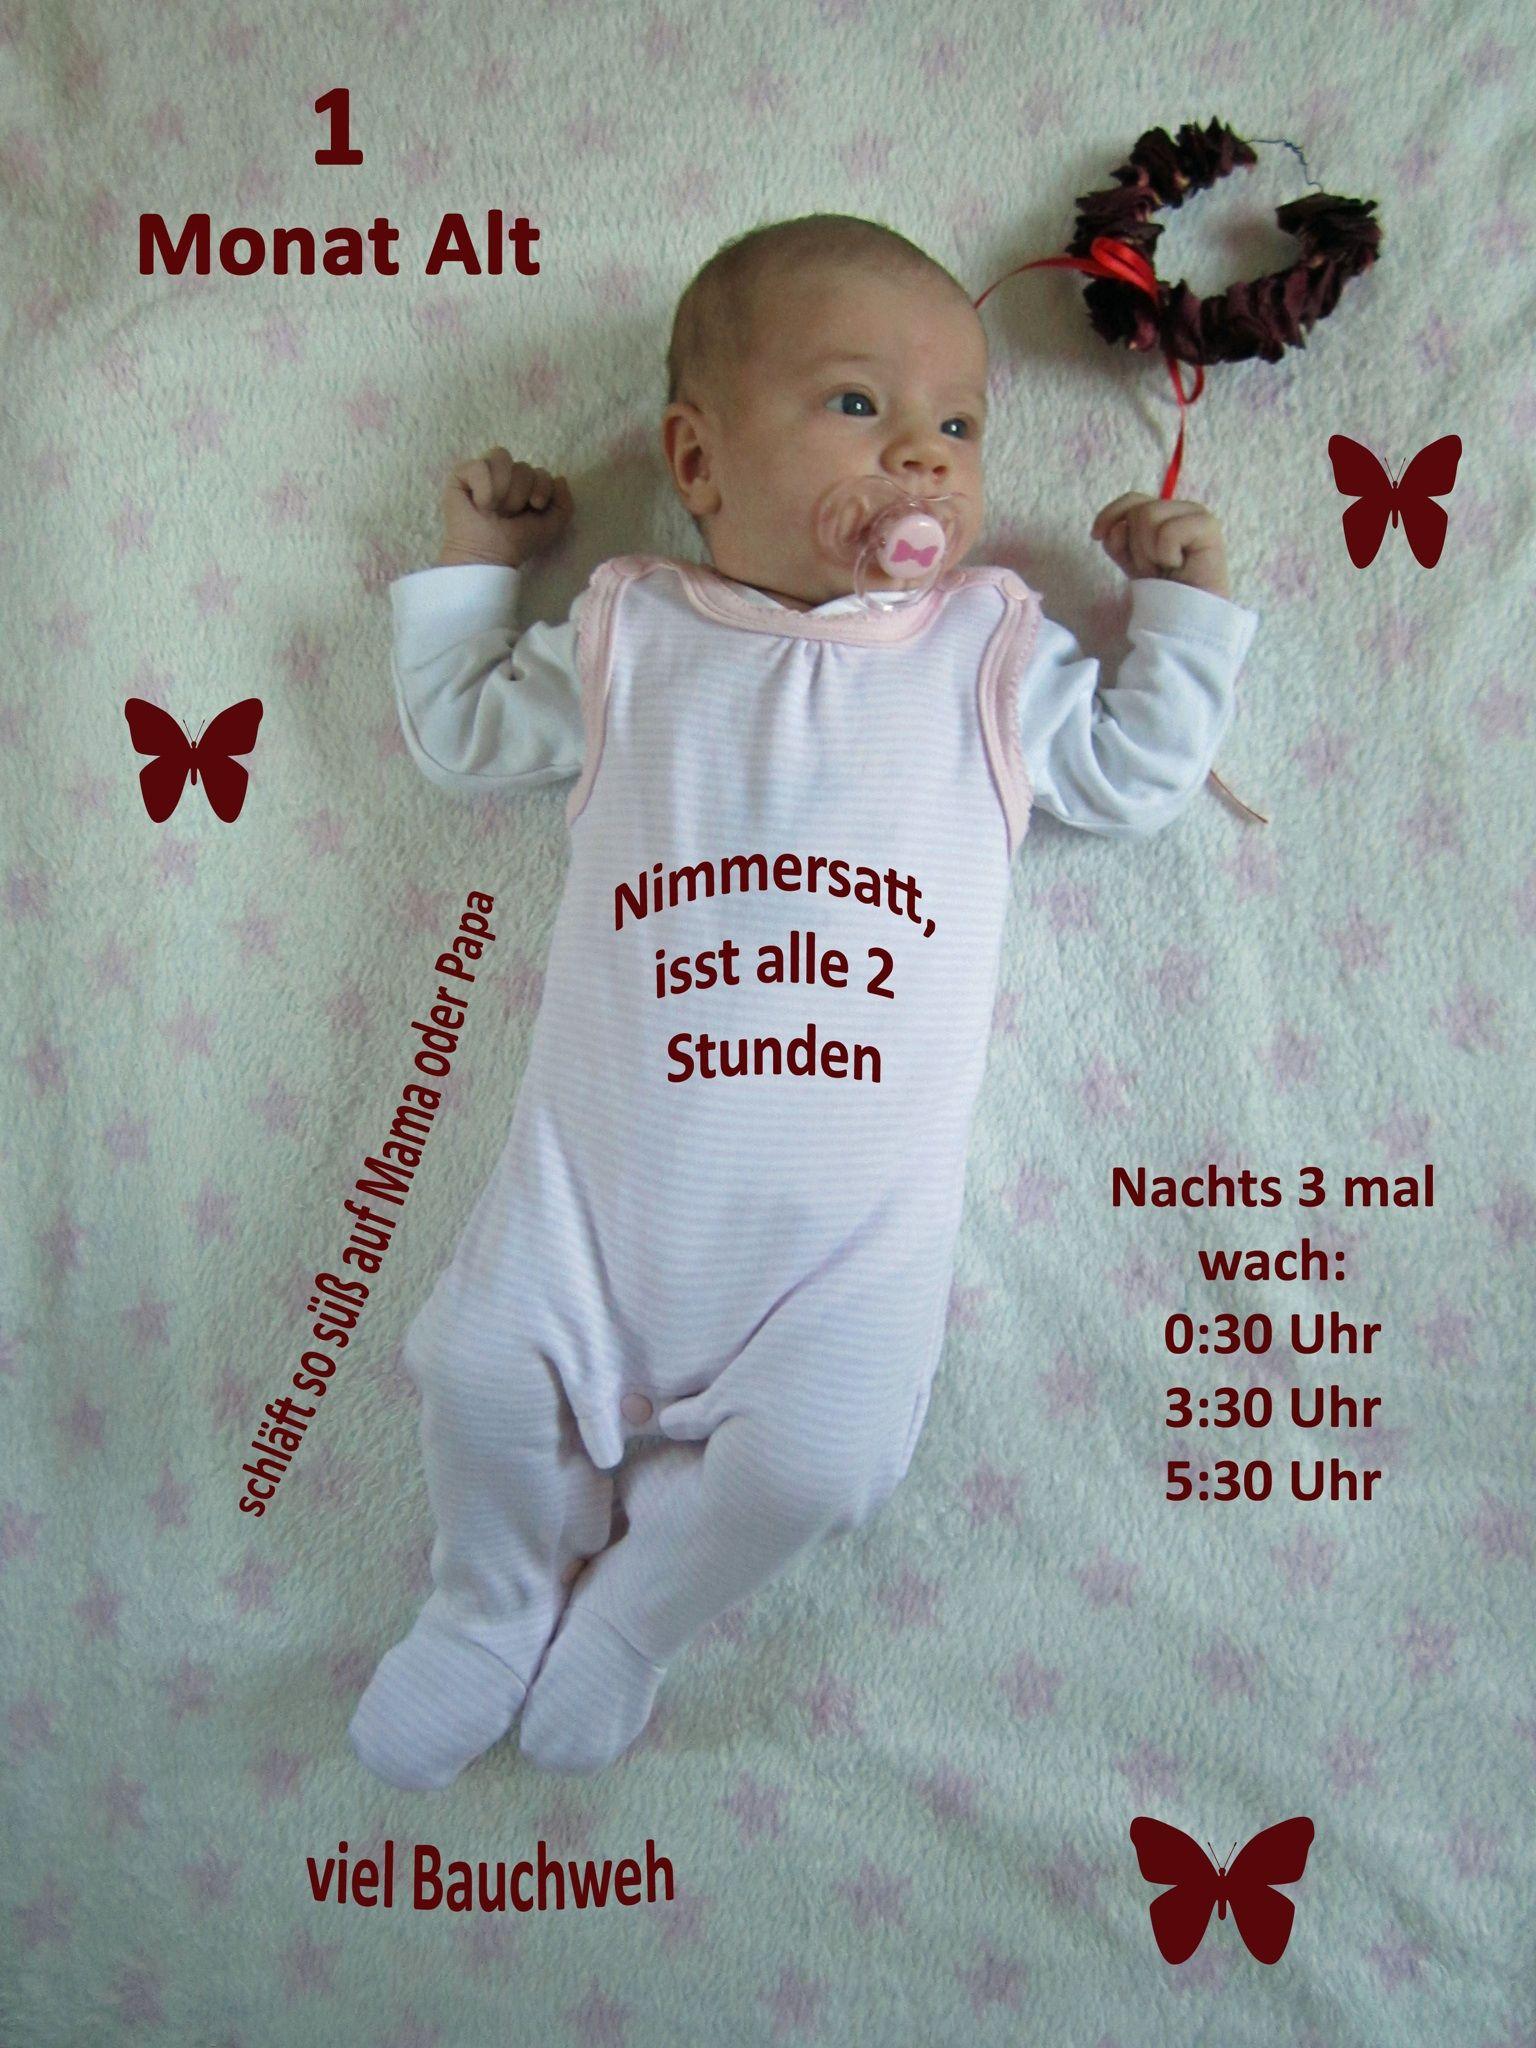 1 Monat alt/ 1 month picture newborn baby | Baby / Kind | Pinterest